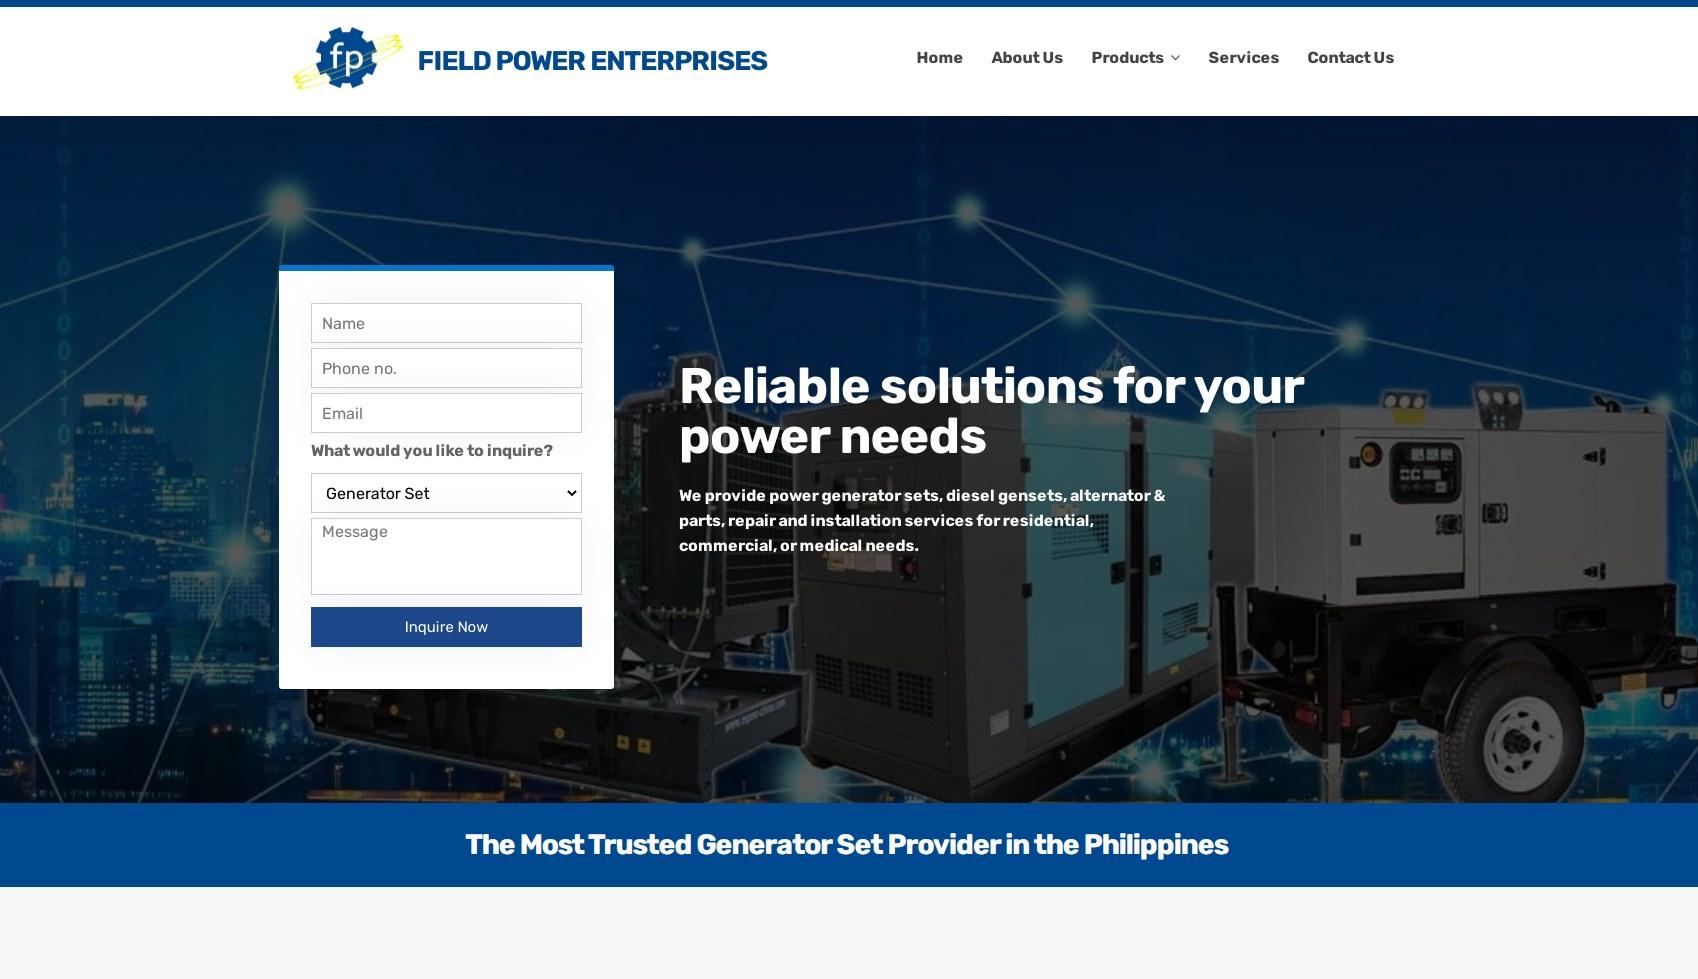 Field Power Generator Enterprises Philippines launches new website